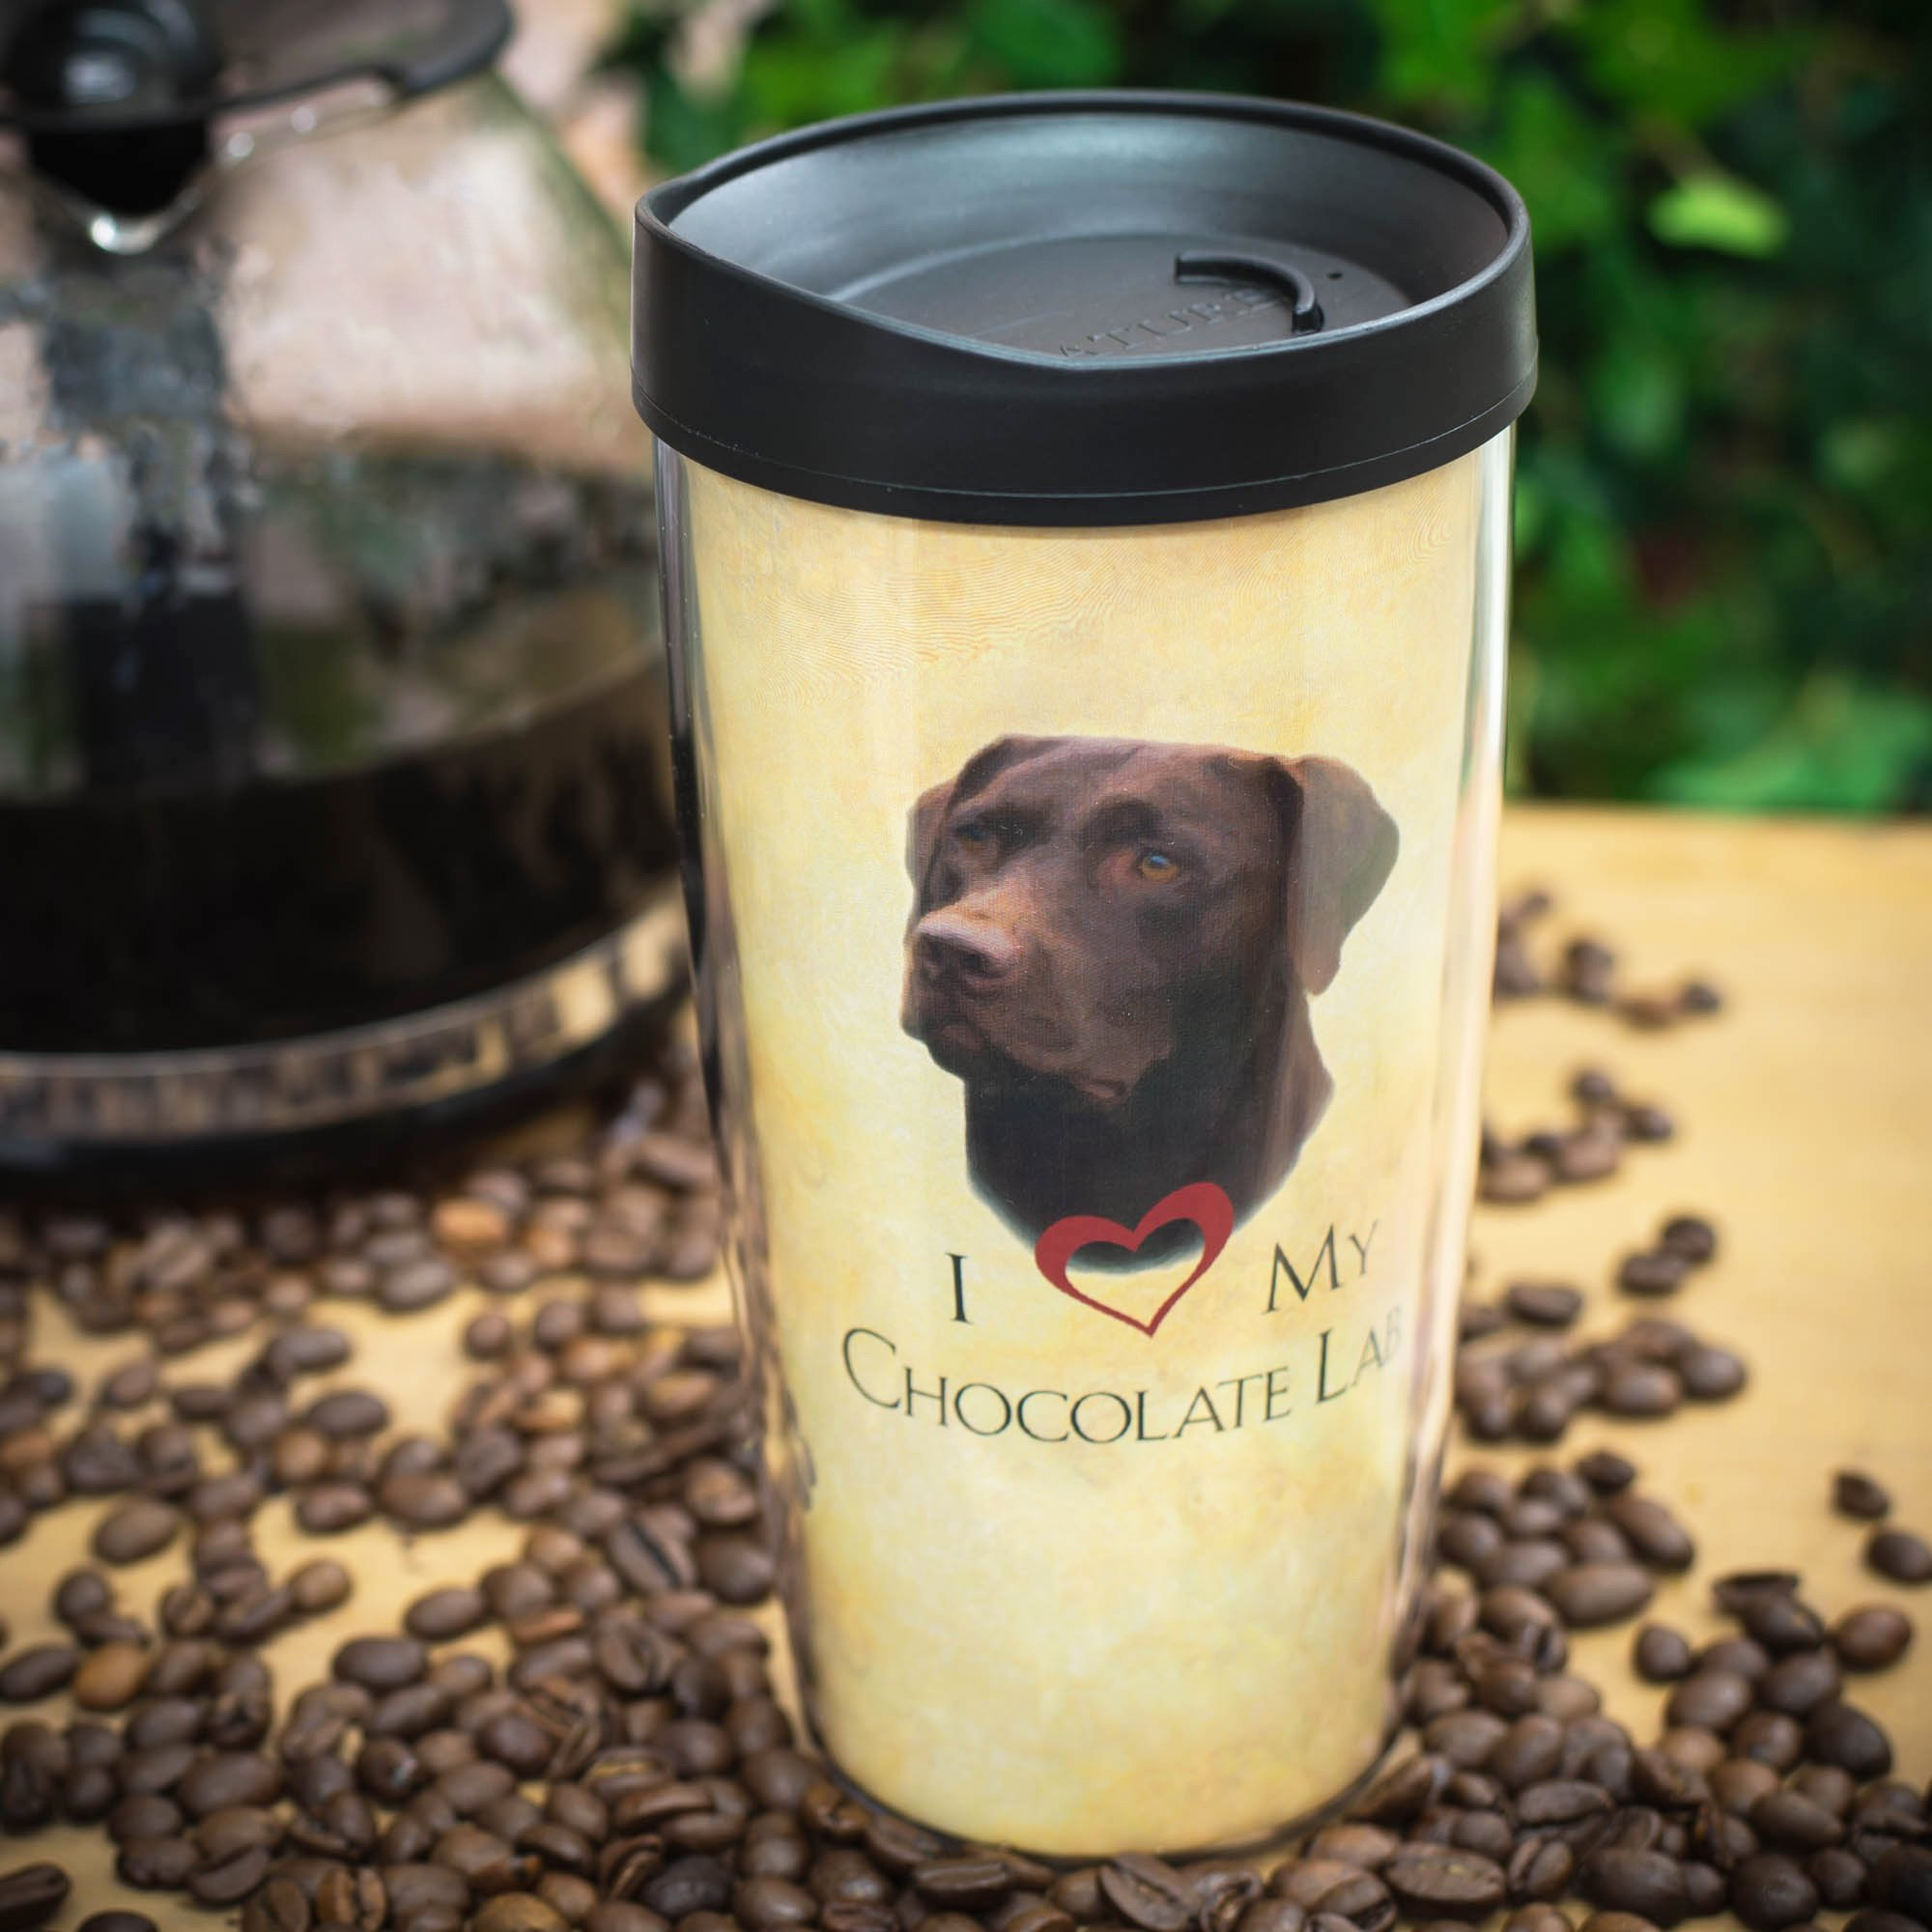 I Love My Chocolate Lab Dog Paws 16 Oz Tumbler Mug with Lid by Signature Tumblers (Image #2)